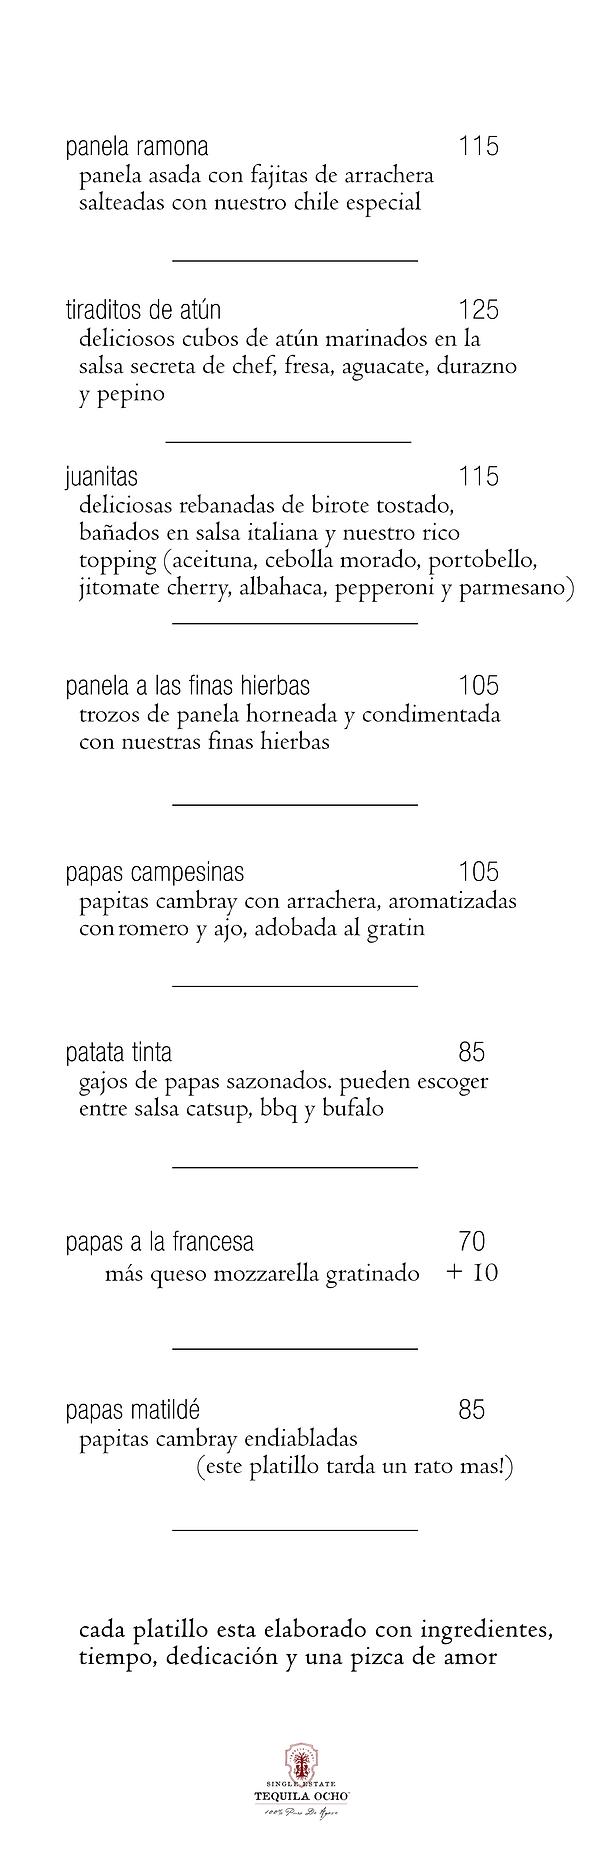 Page-3-Entradas-pt2.jpg.png